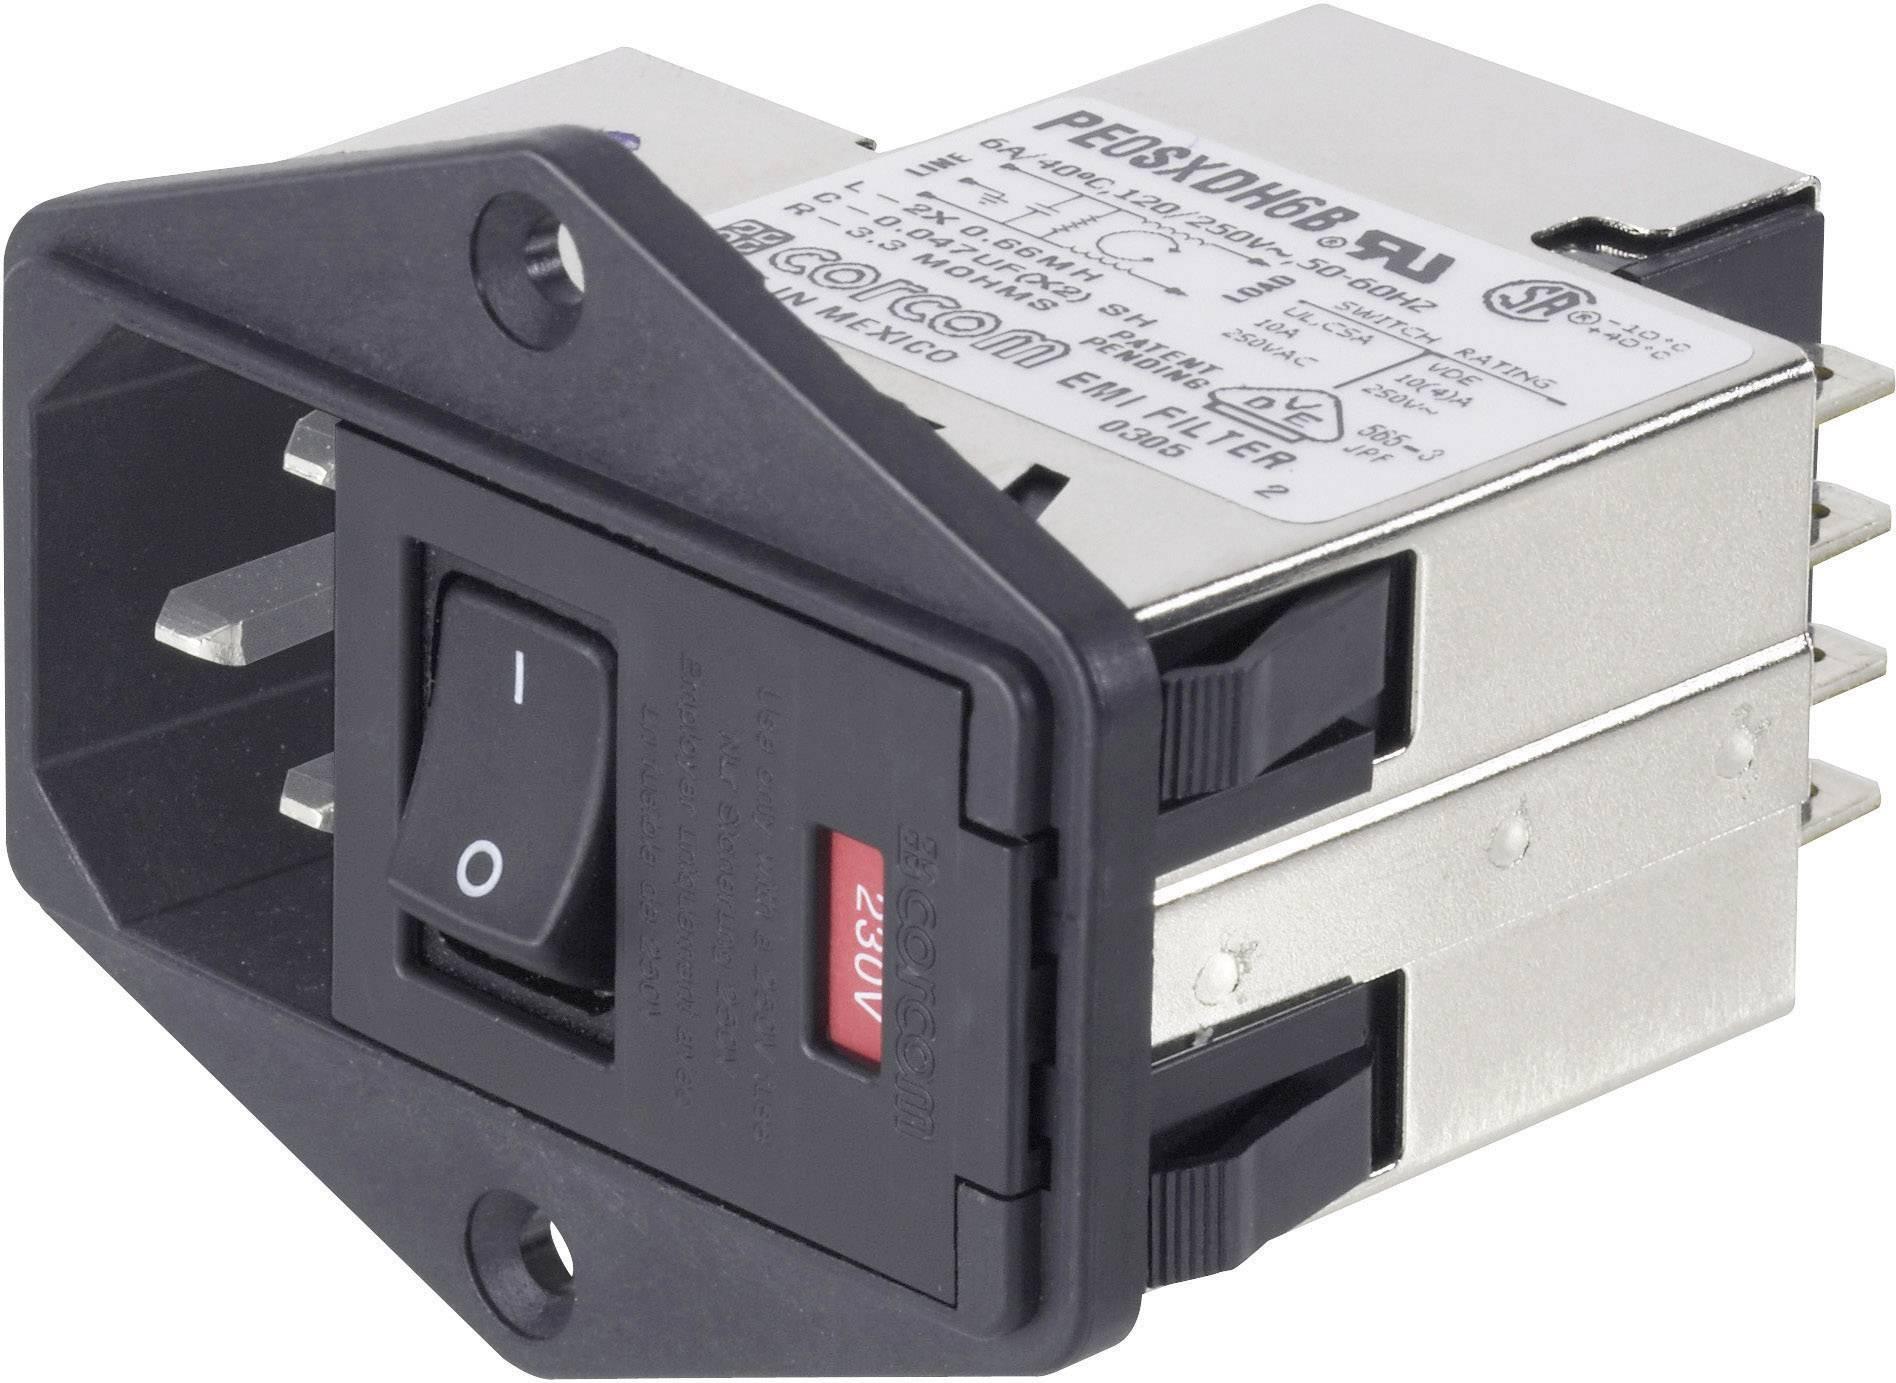 Síťový filtr TE Connectivity, PS000DSXB=C1260, 250 V/AC, 10 A